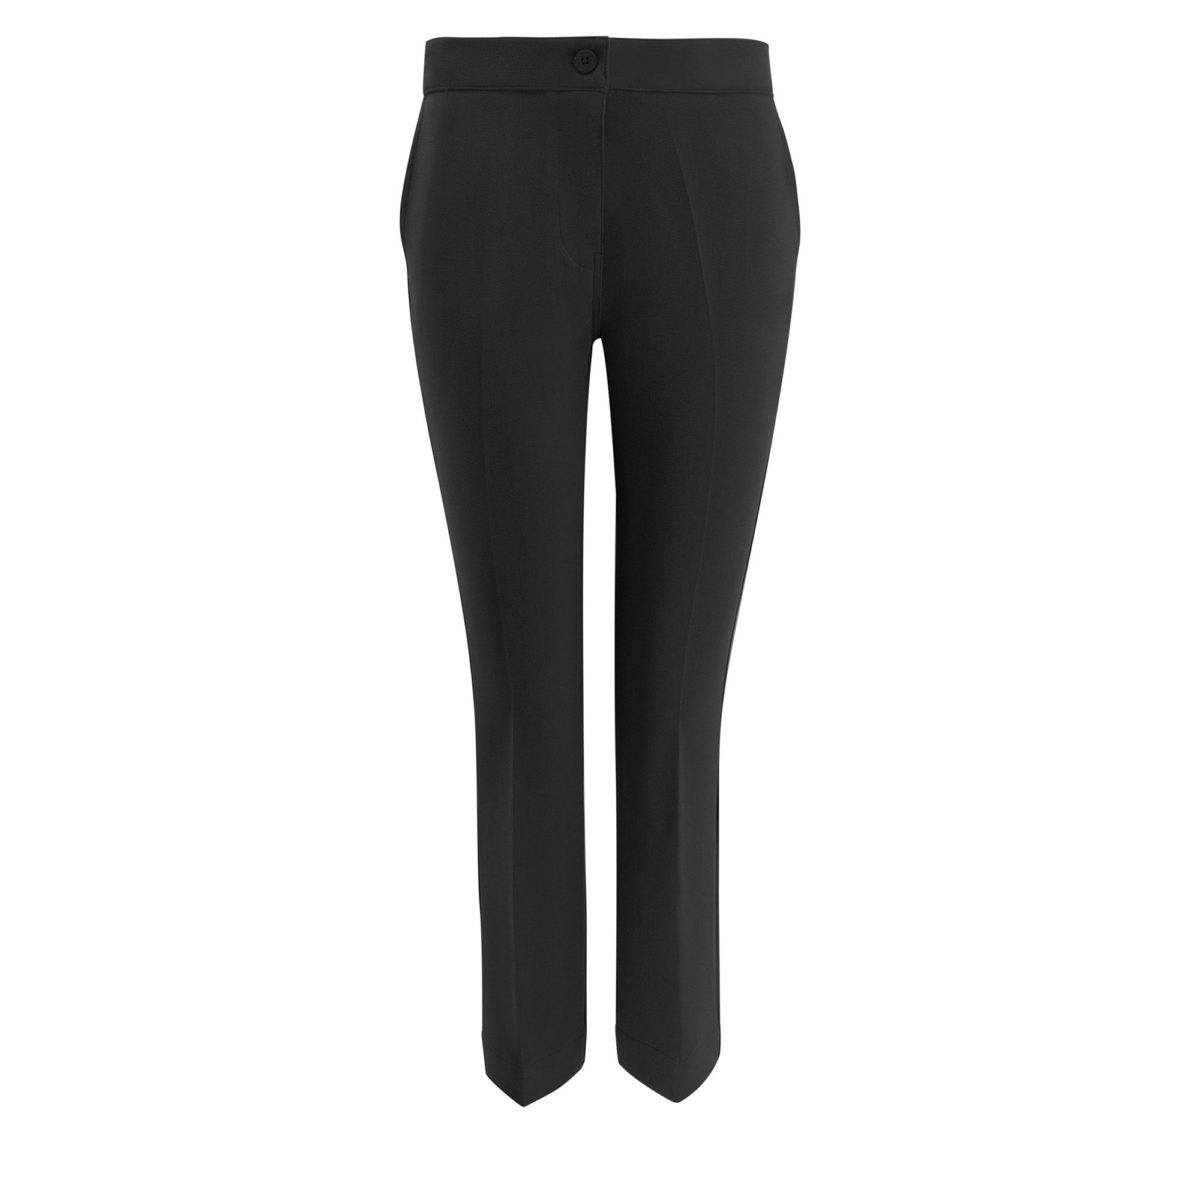 Pantalone Flare Nero - vista frontale | Nicla